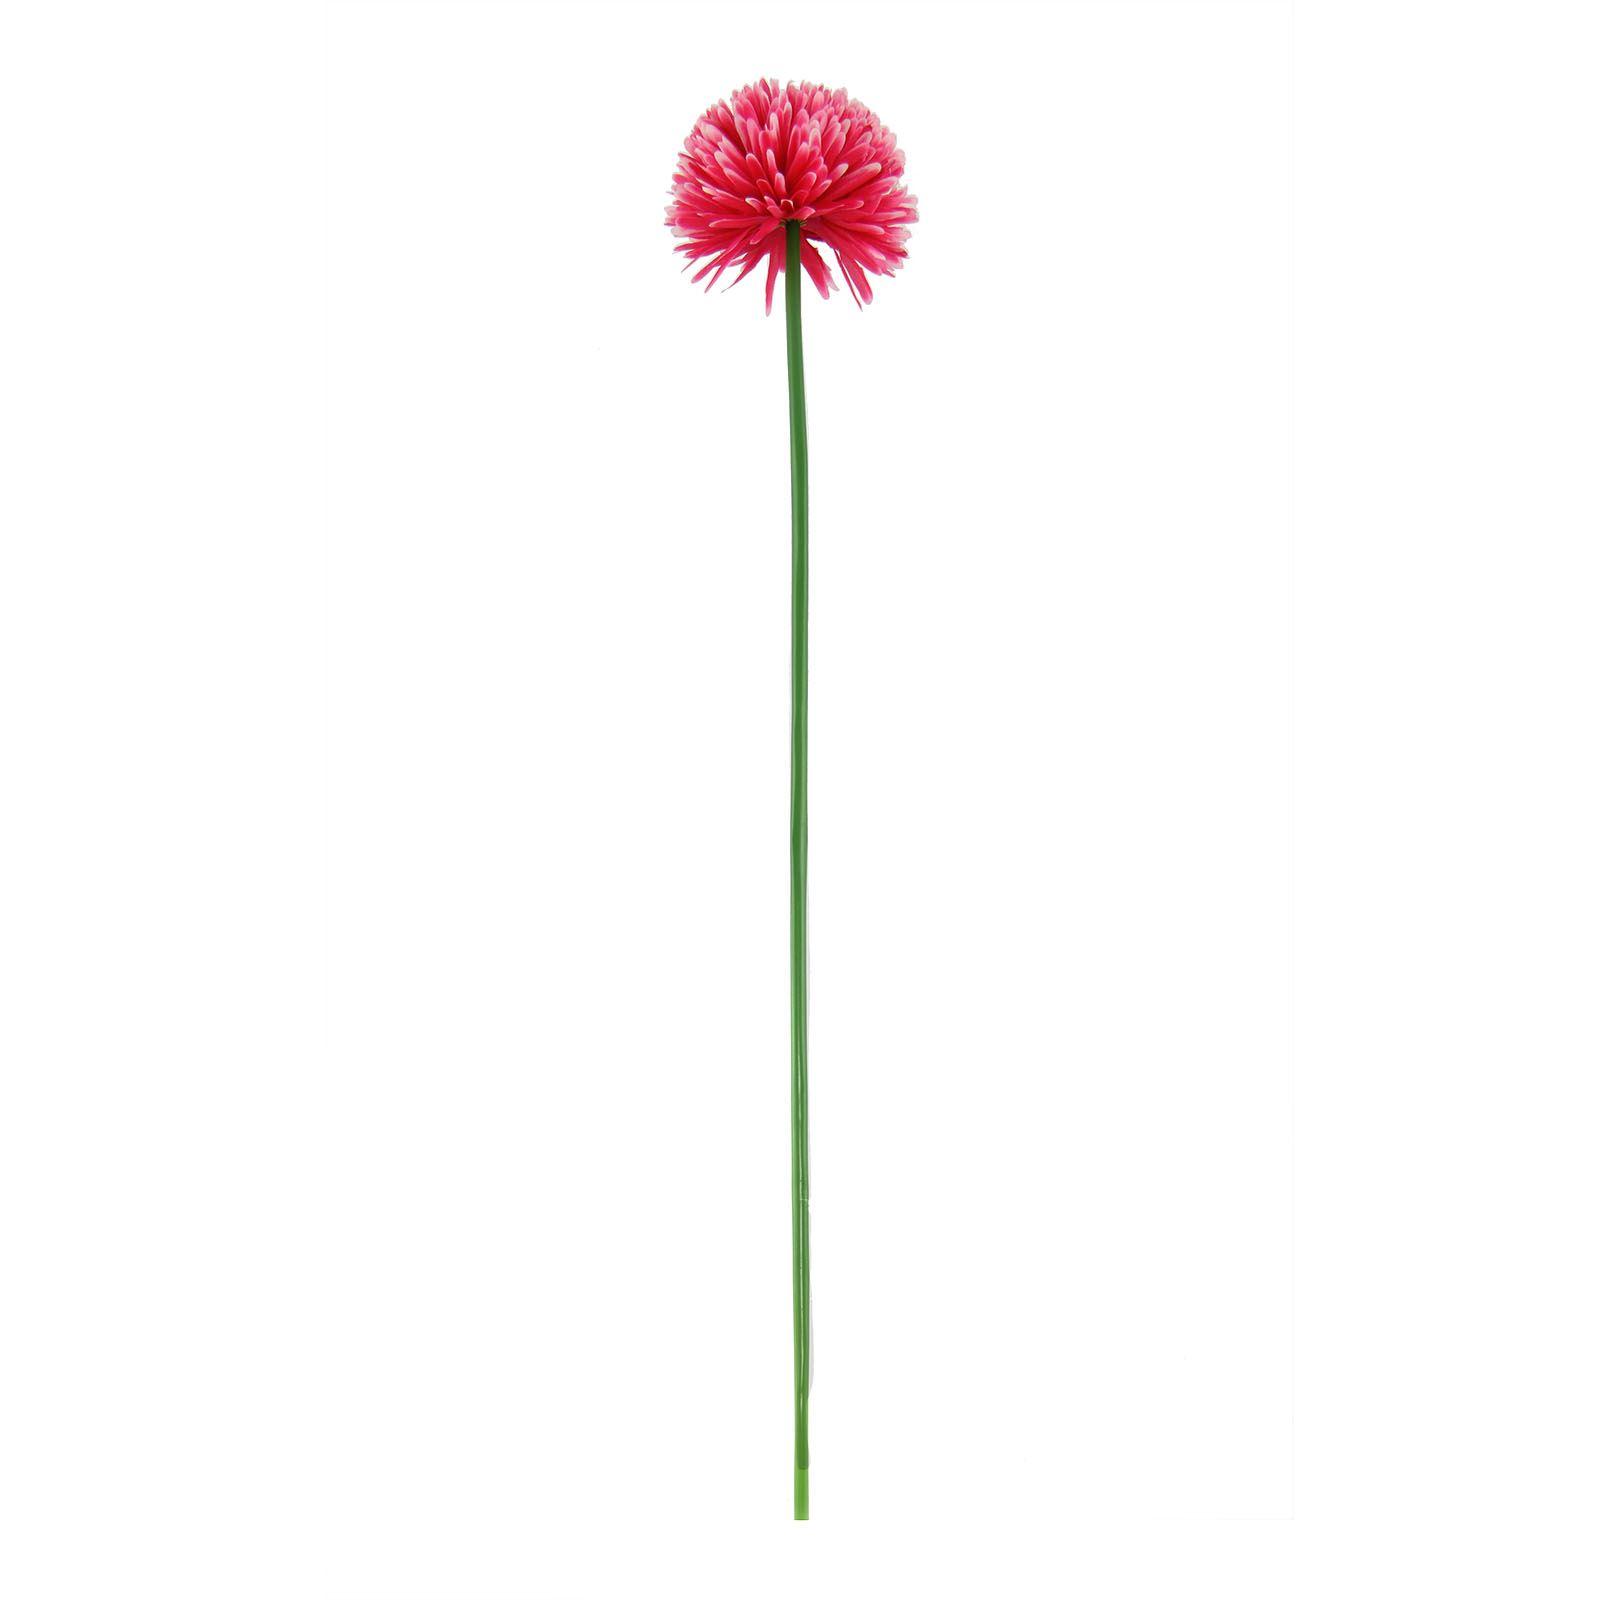 Long flower photo